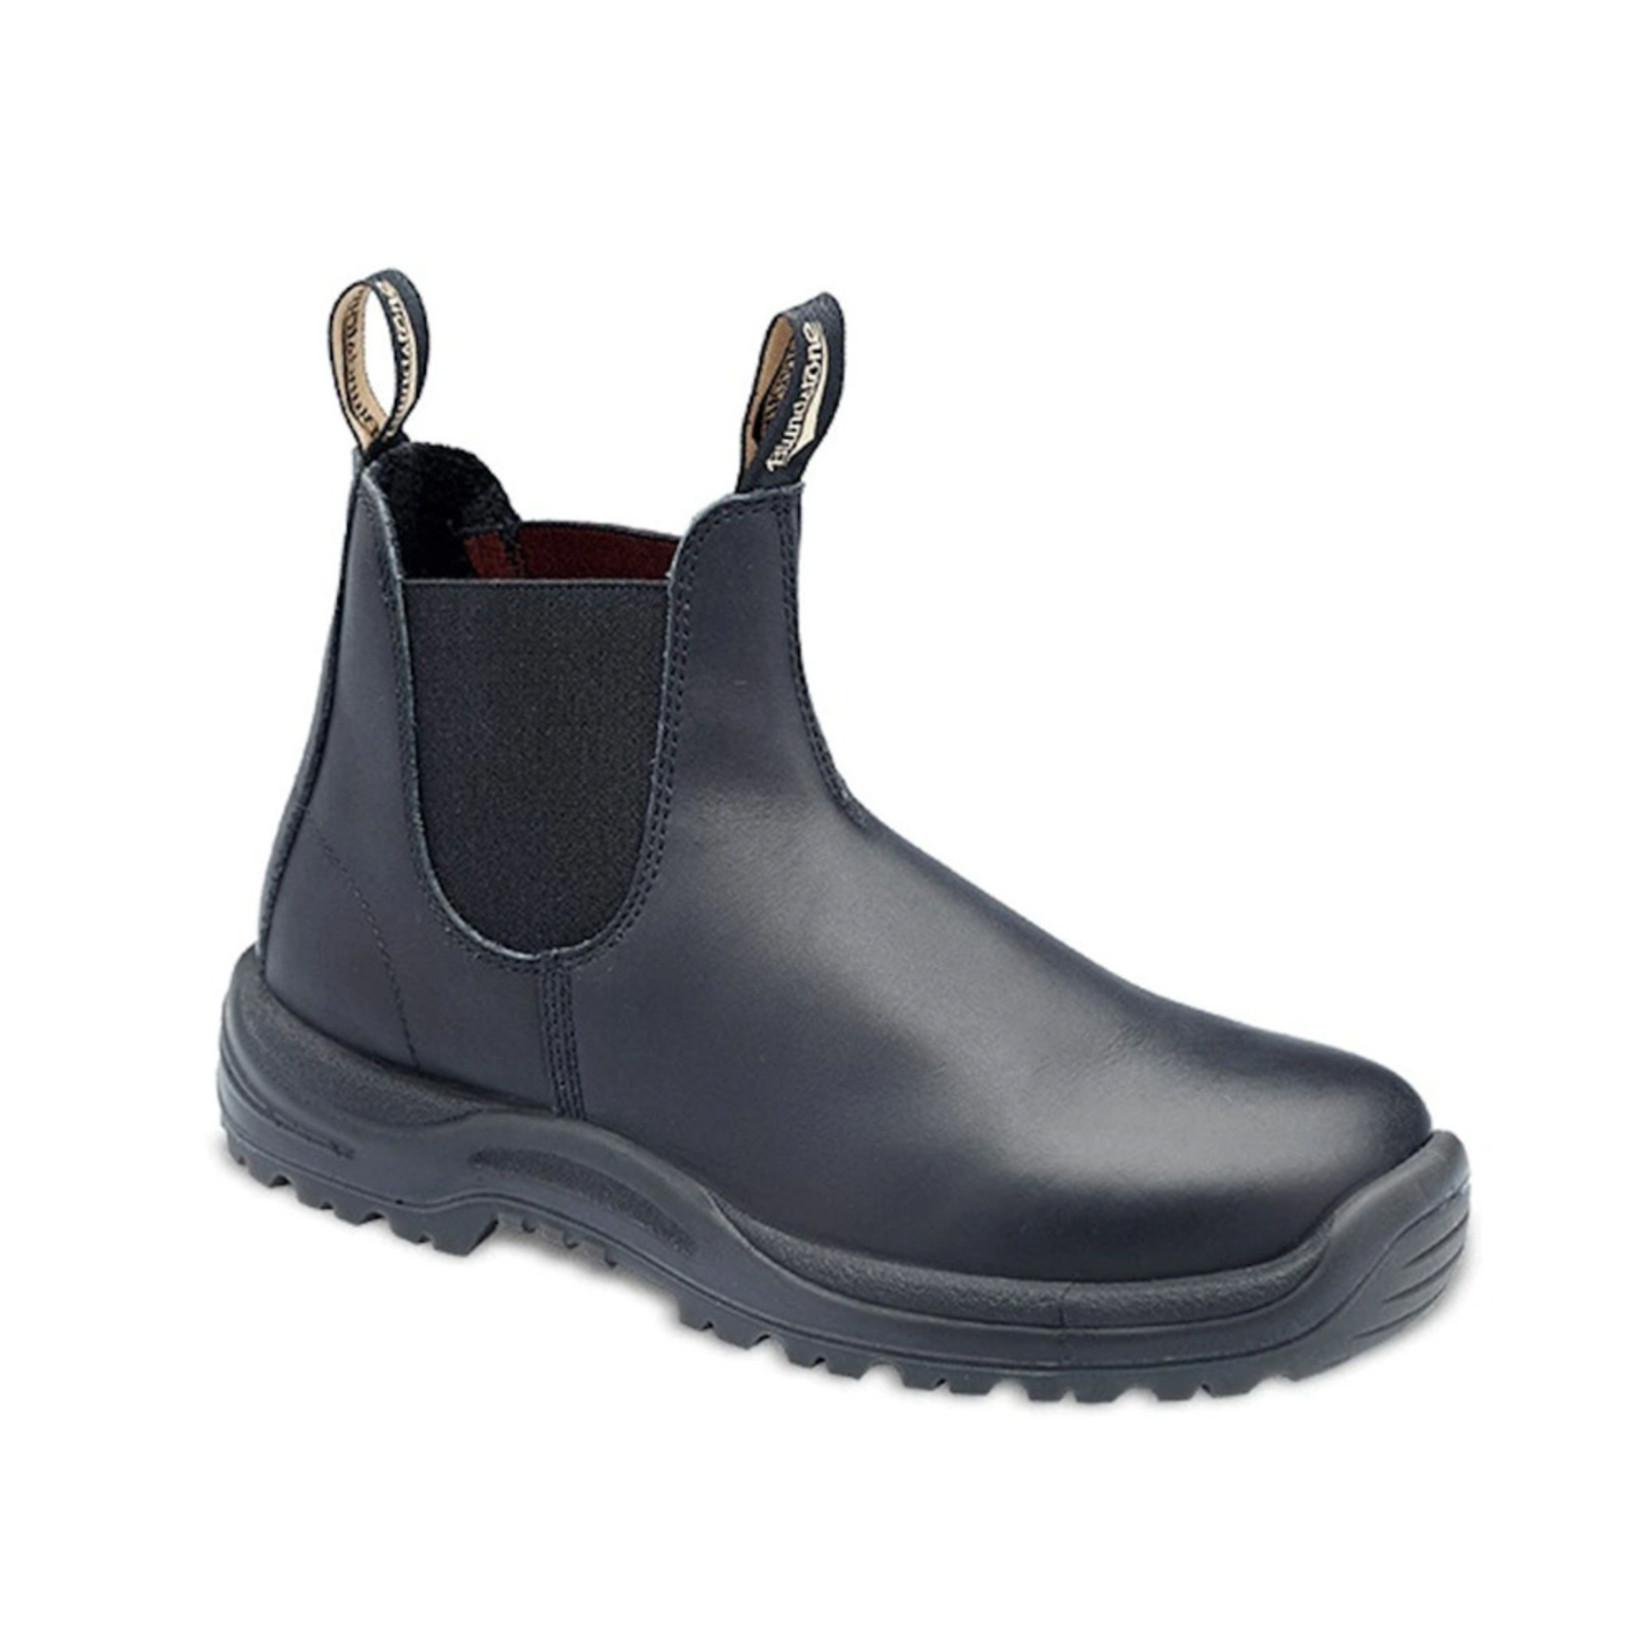 Blundstone Blundstone Soft Toe Black 491